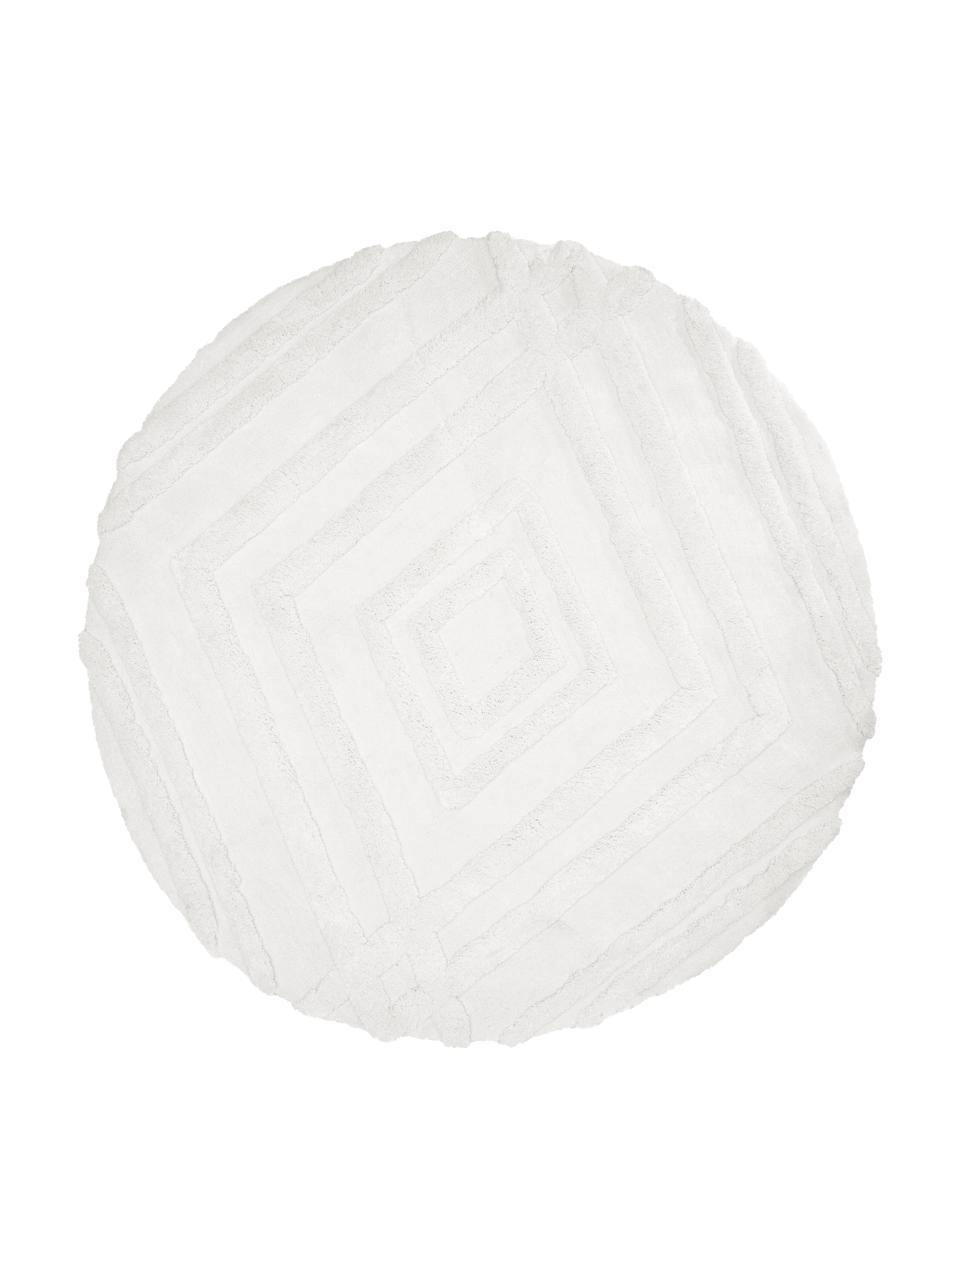 Tapis rond shaggy moelleux ethnique Magda, Blanc crème